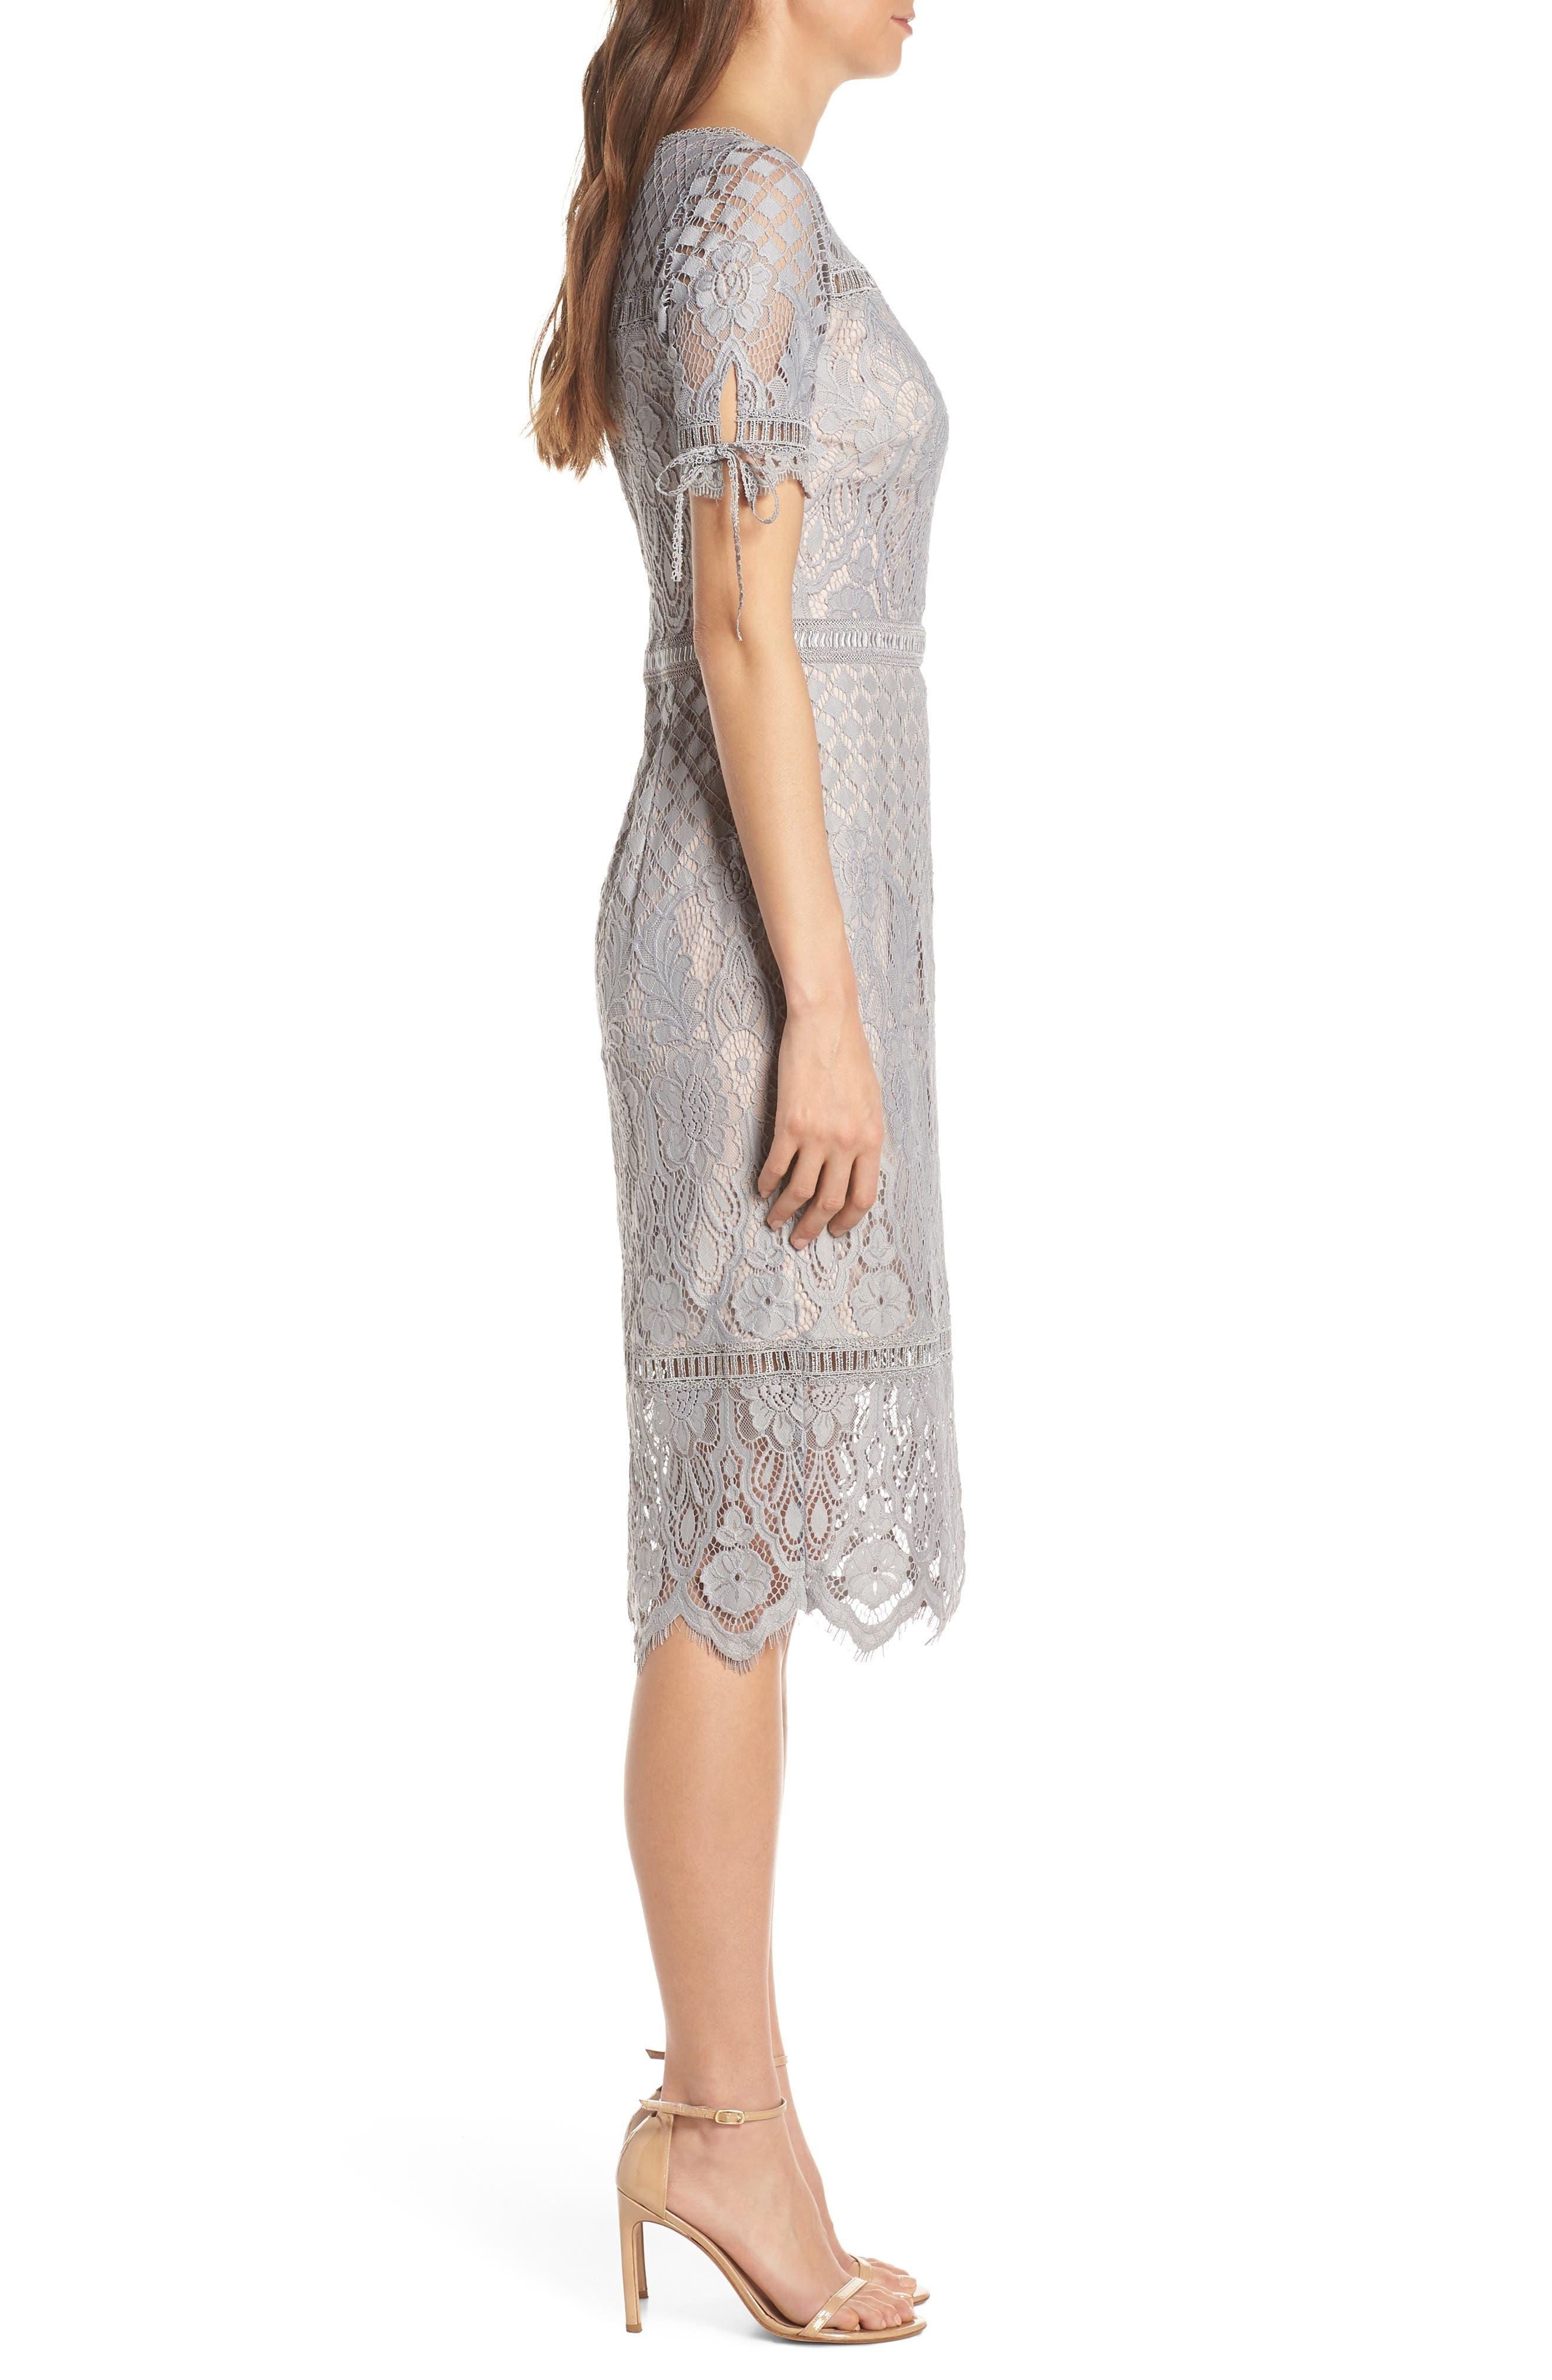 TADASHI SHOJI, Tie Sleeve Lace Sheath Dress, Alternate thumbnail 4, color, PEWTER/ PETAL